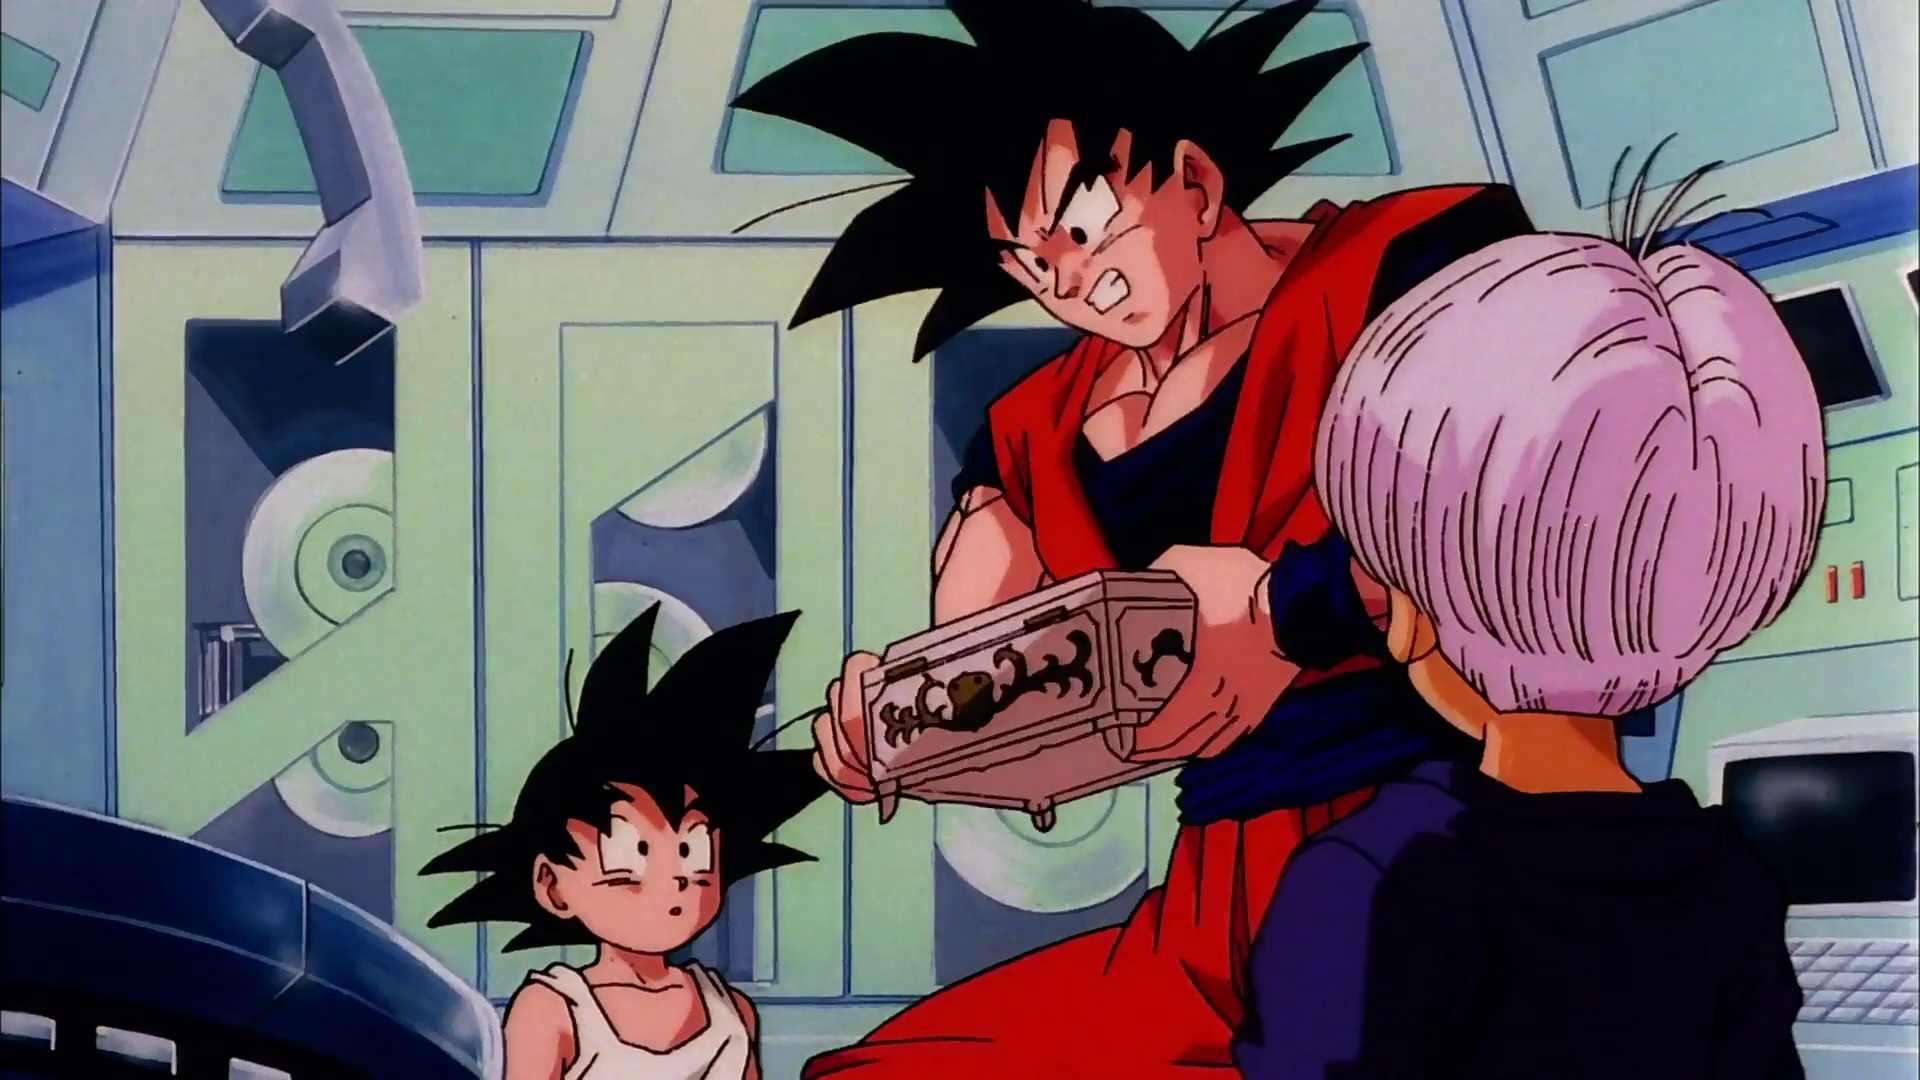 Arquivo:Gokusbox.jpg